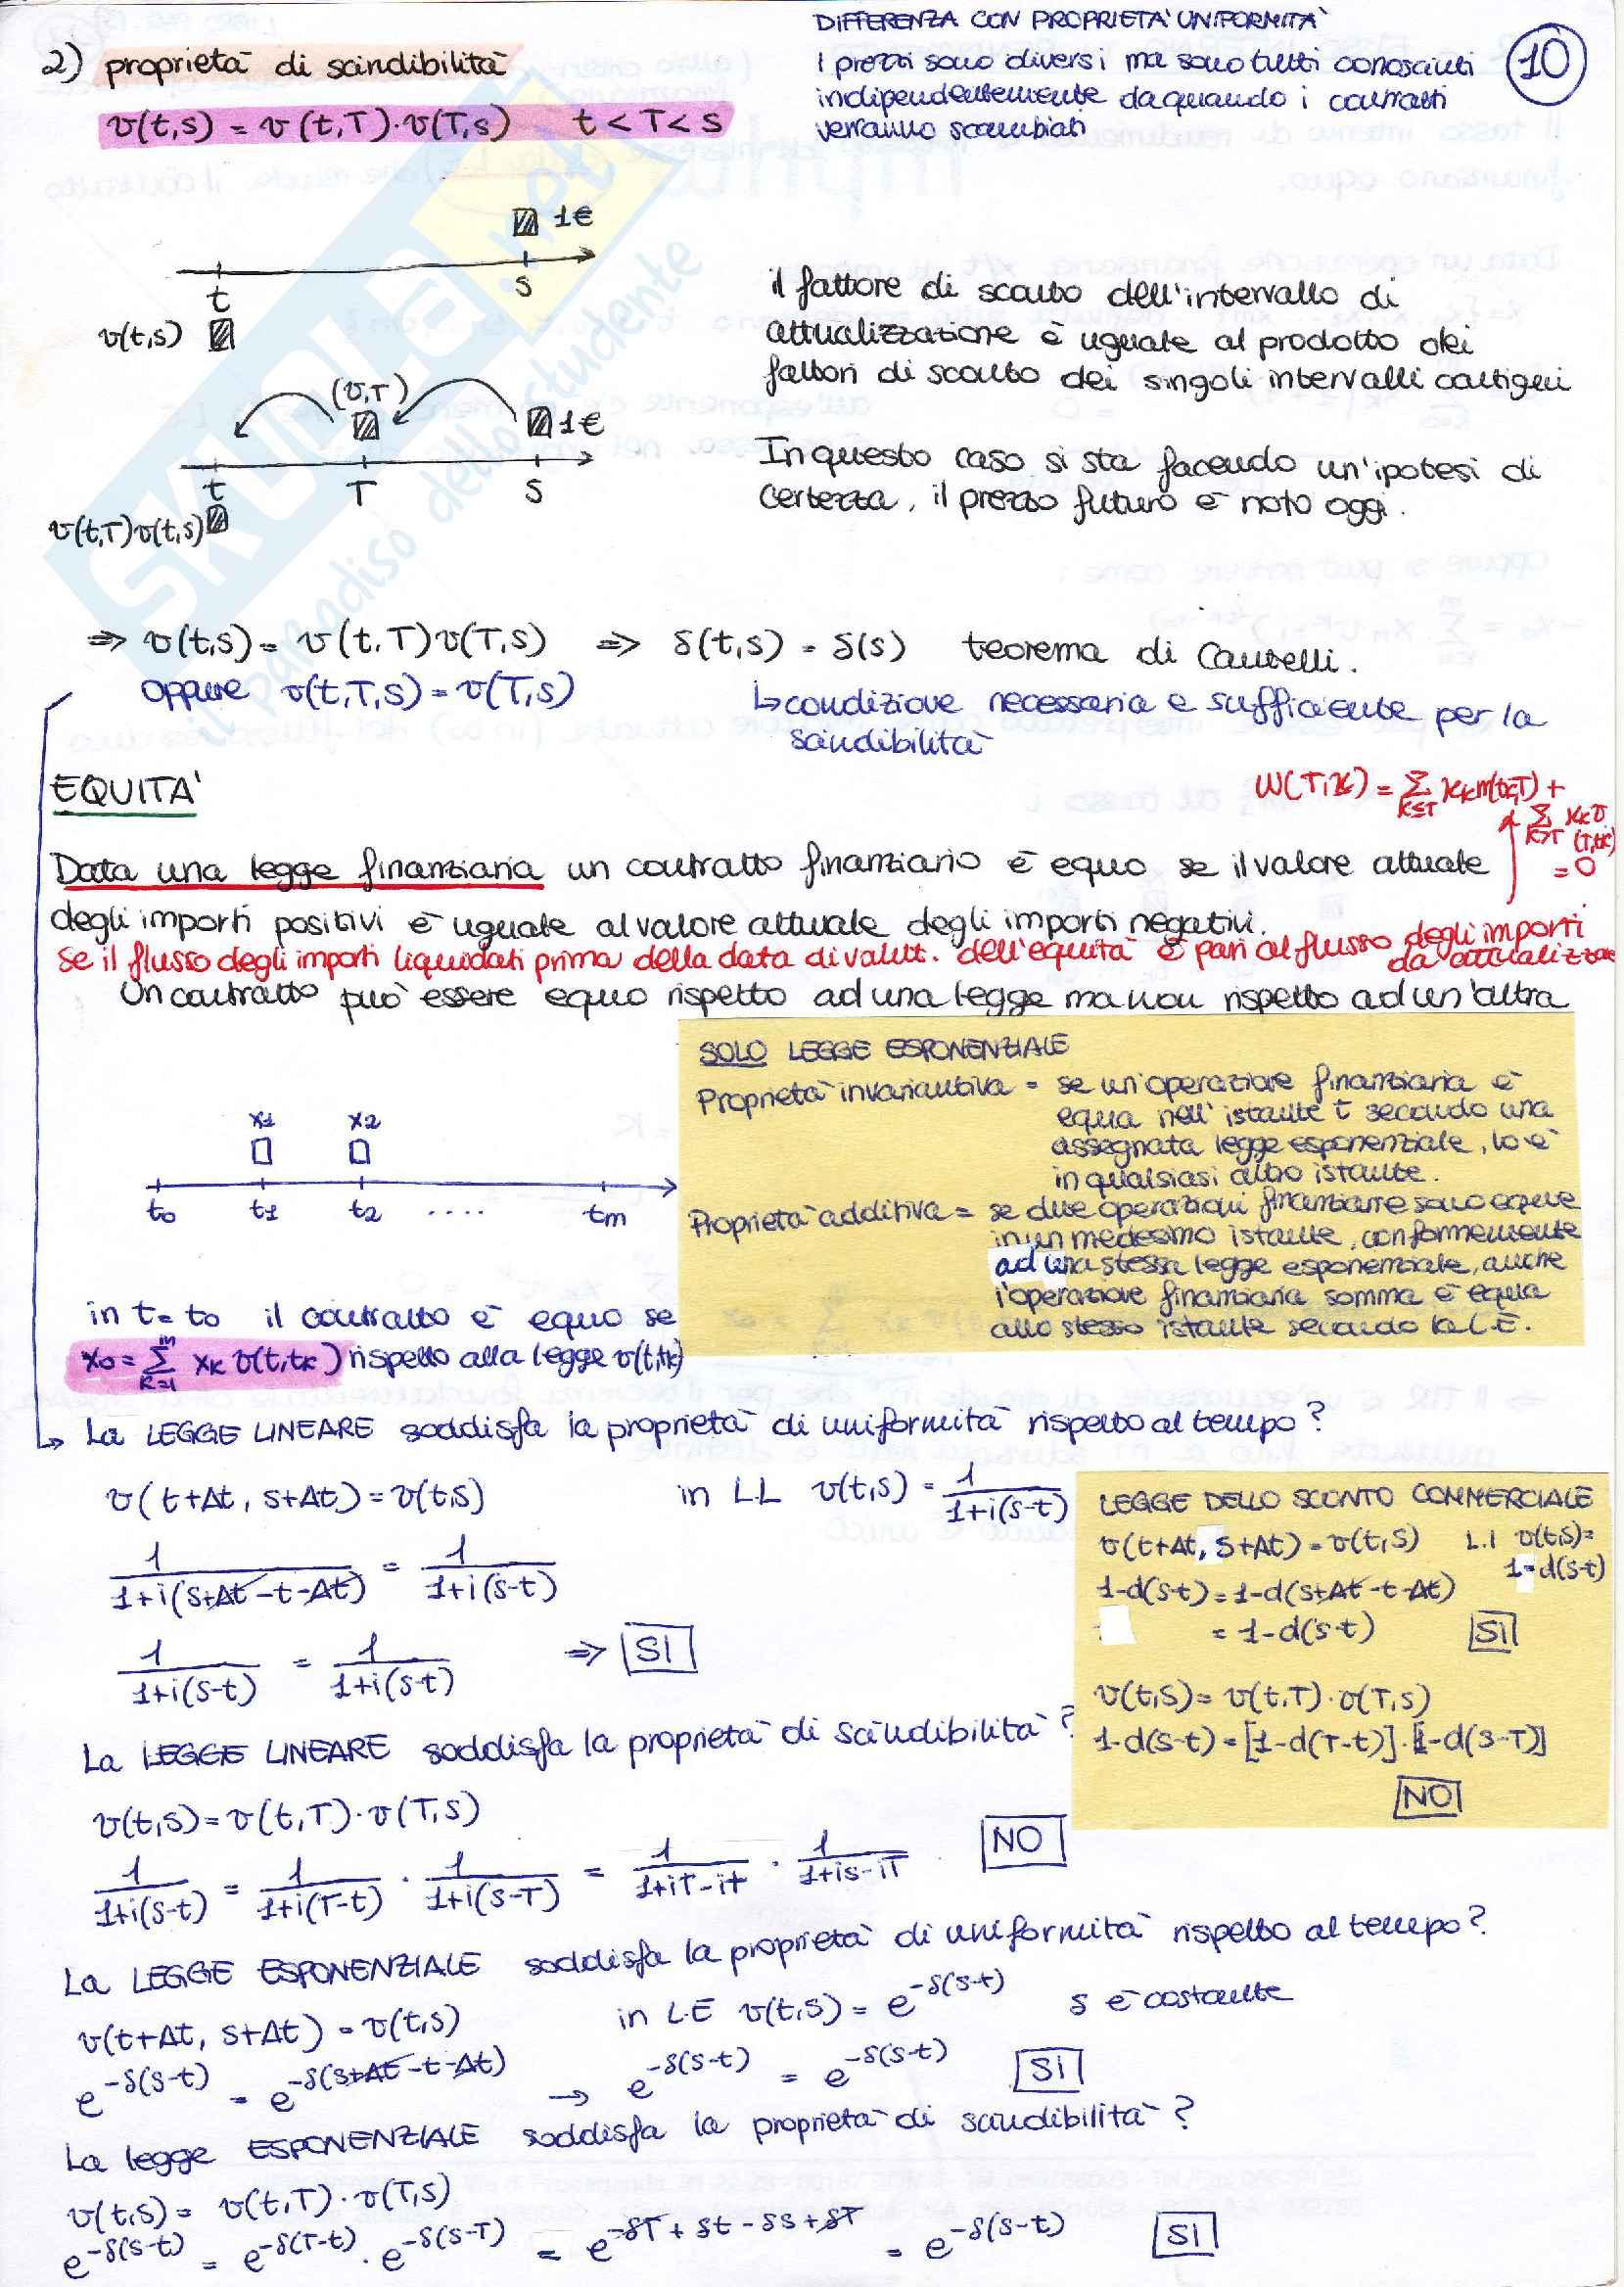 Matematica finanziaria appunti, prof. Mottura Pag. 11